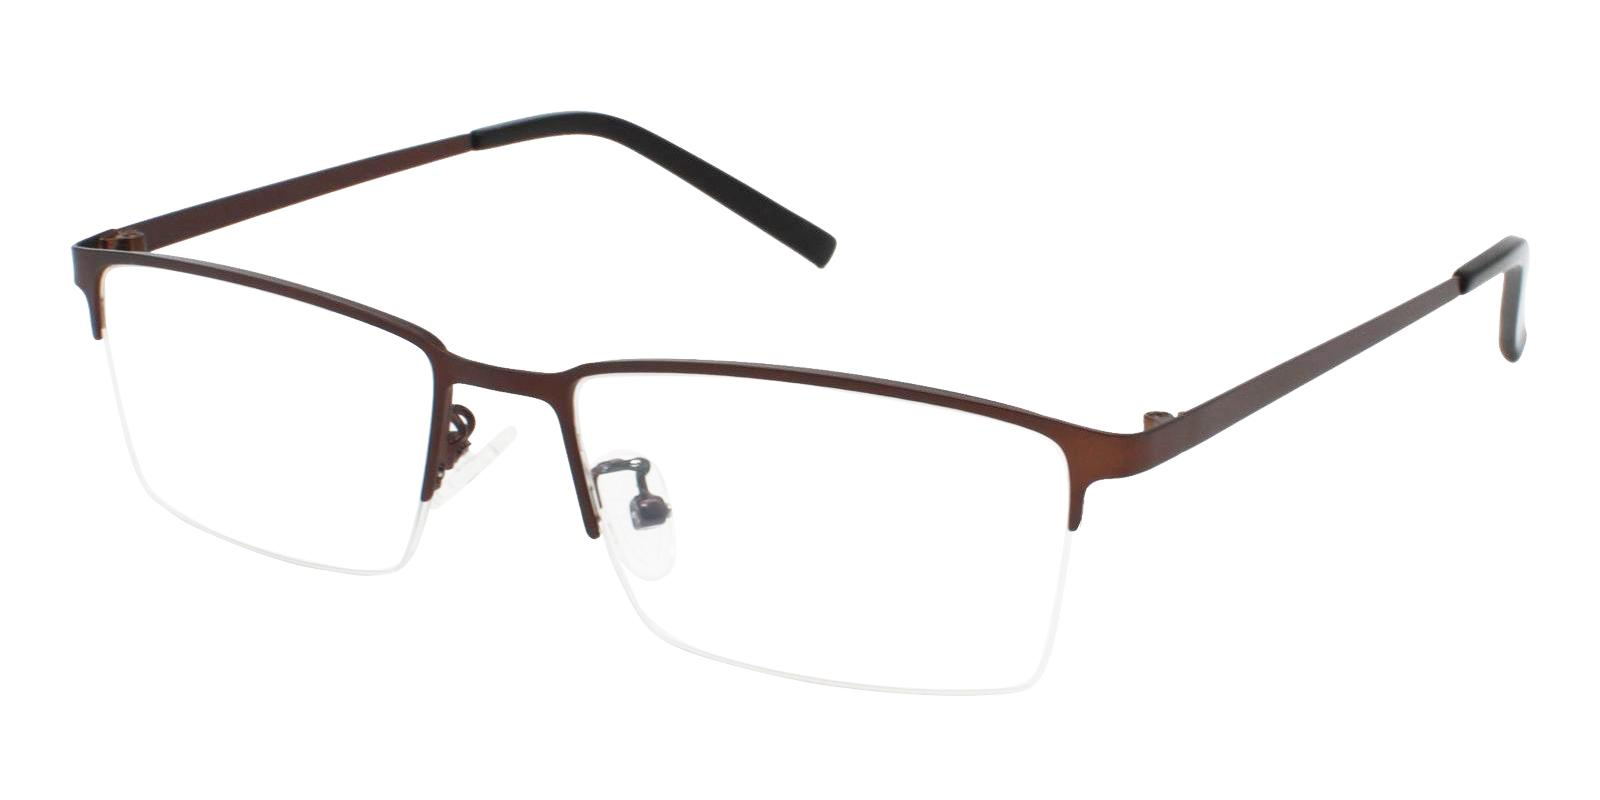 Alexander Brown Metal Eyeglasses , NosePads Frames from ABBE Glasses